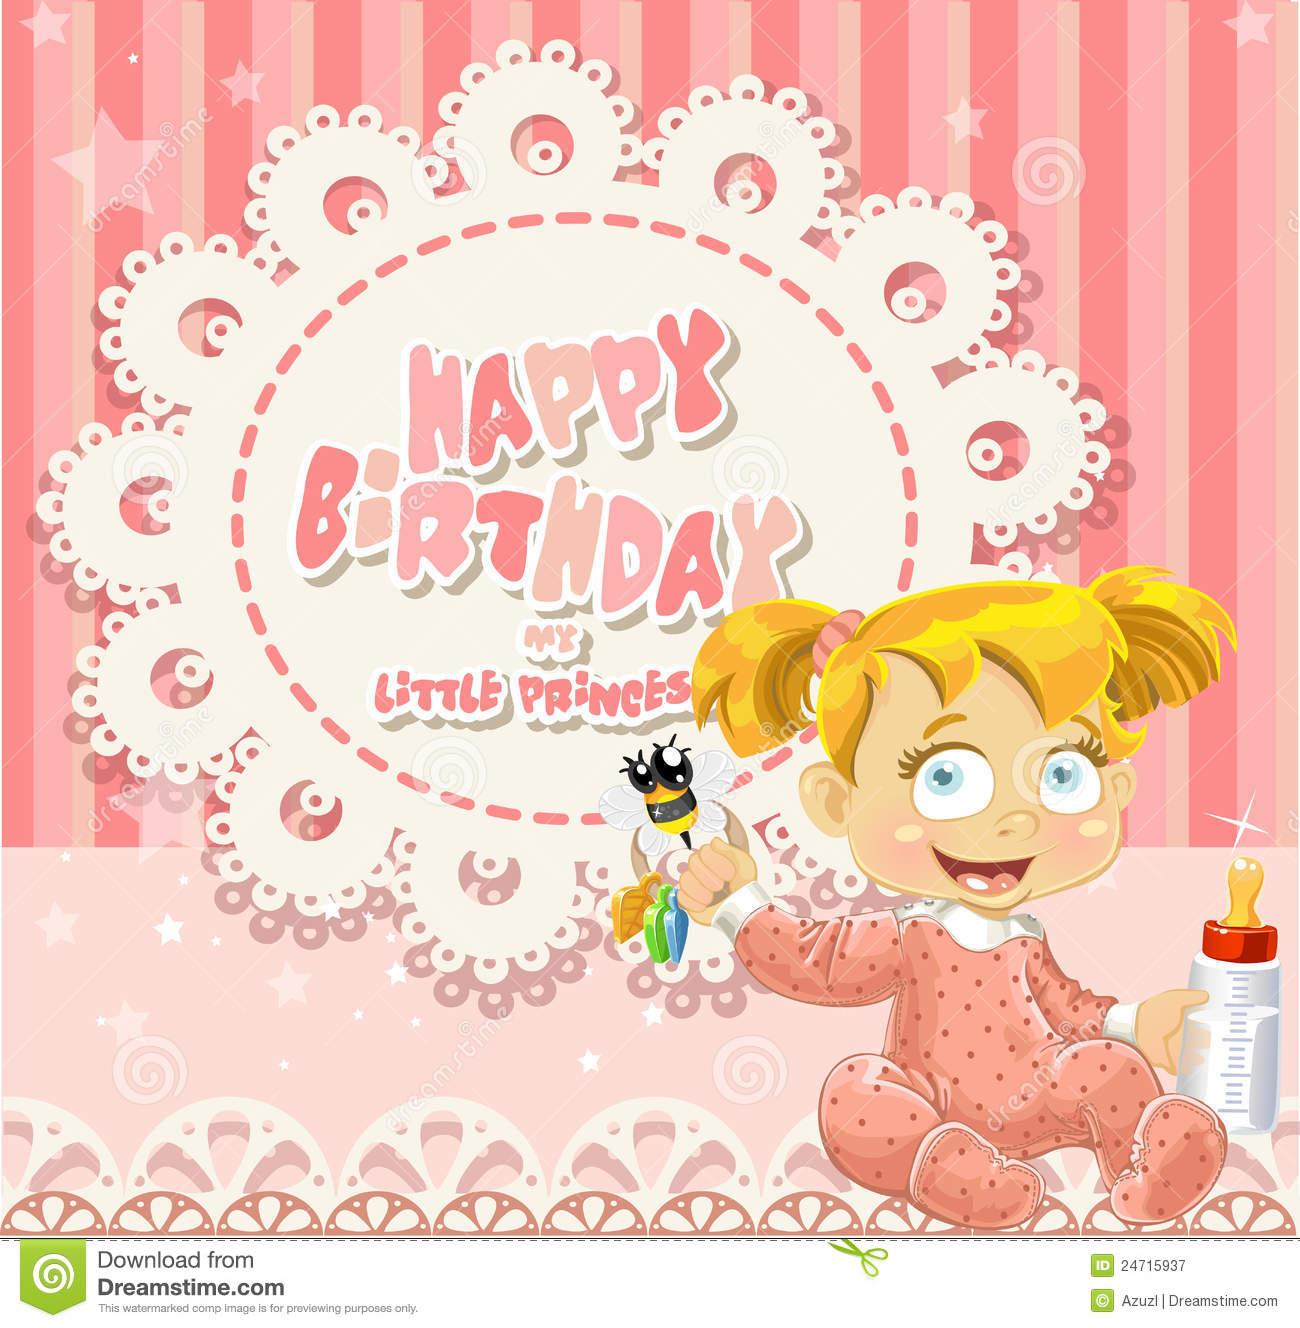 Happy Birthday Baby Girl Quotes. QuotesGram